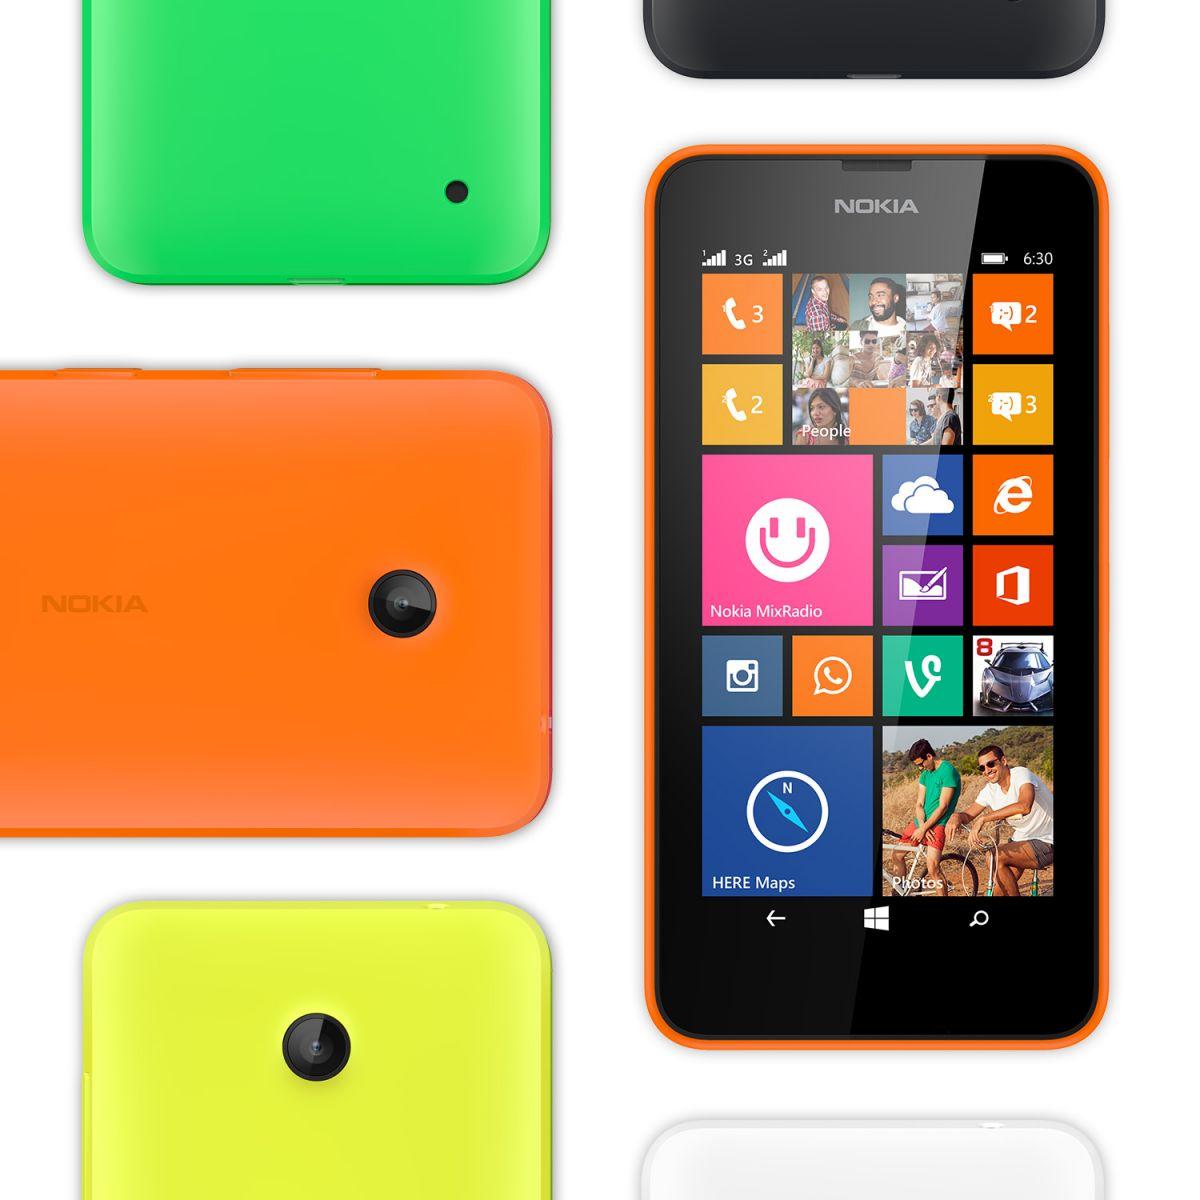 nokia lumia 630 dual sim windows phone 8 1 handset announced. Black Bedroom Furniture Sets. Home Design Ideas